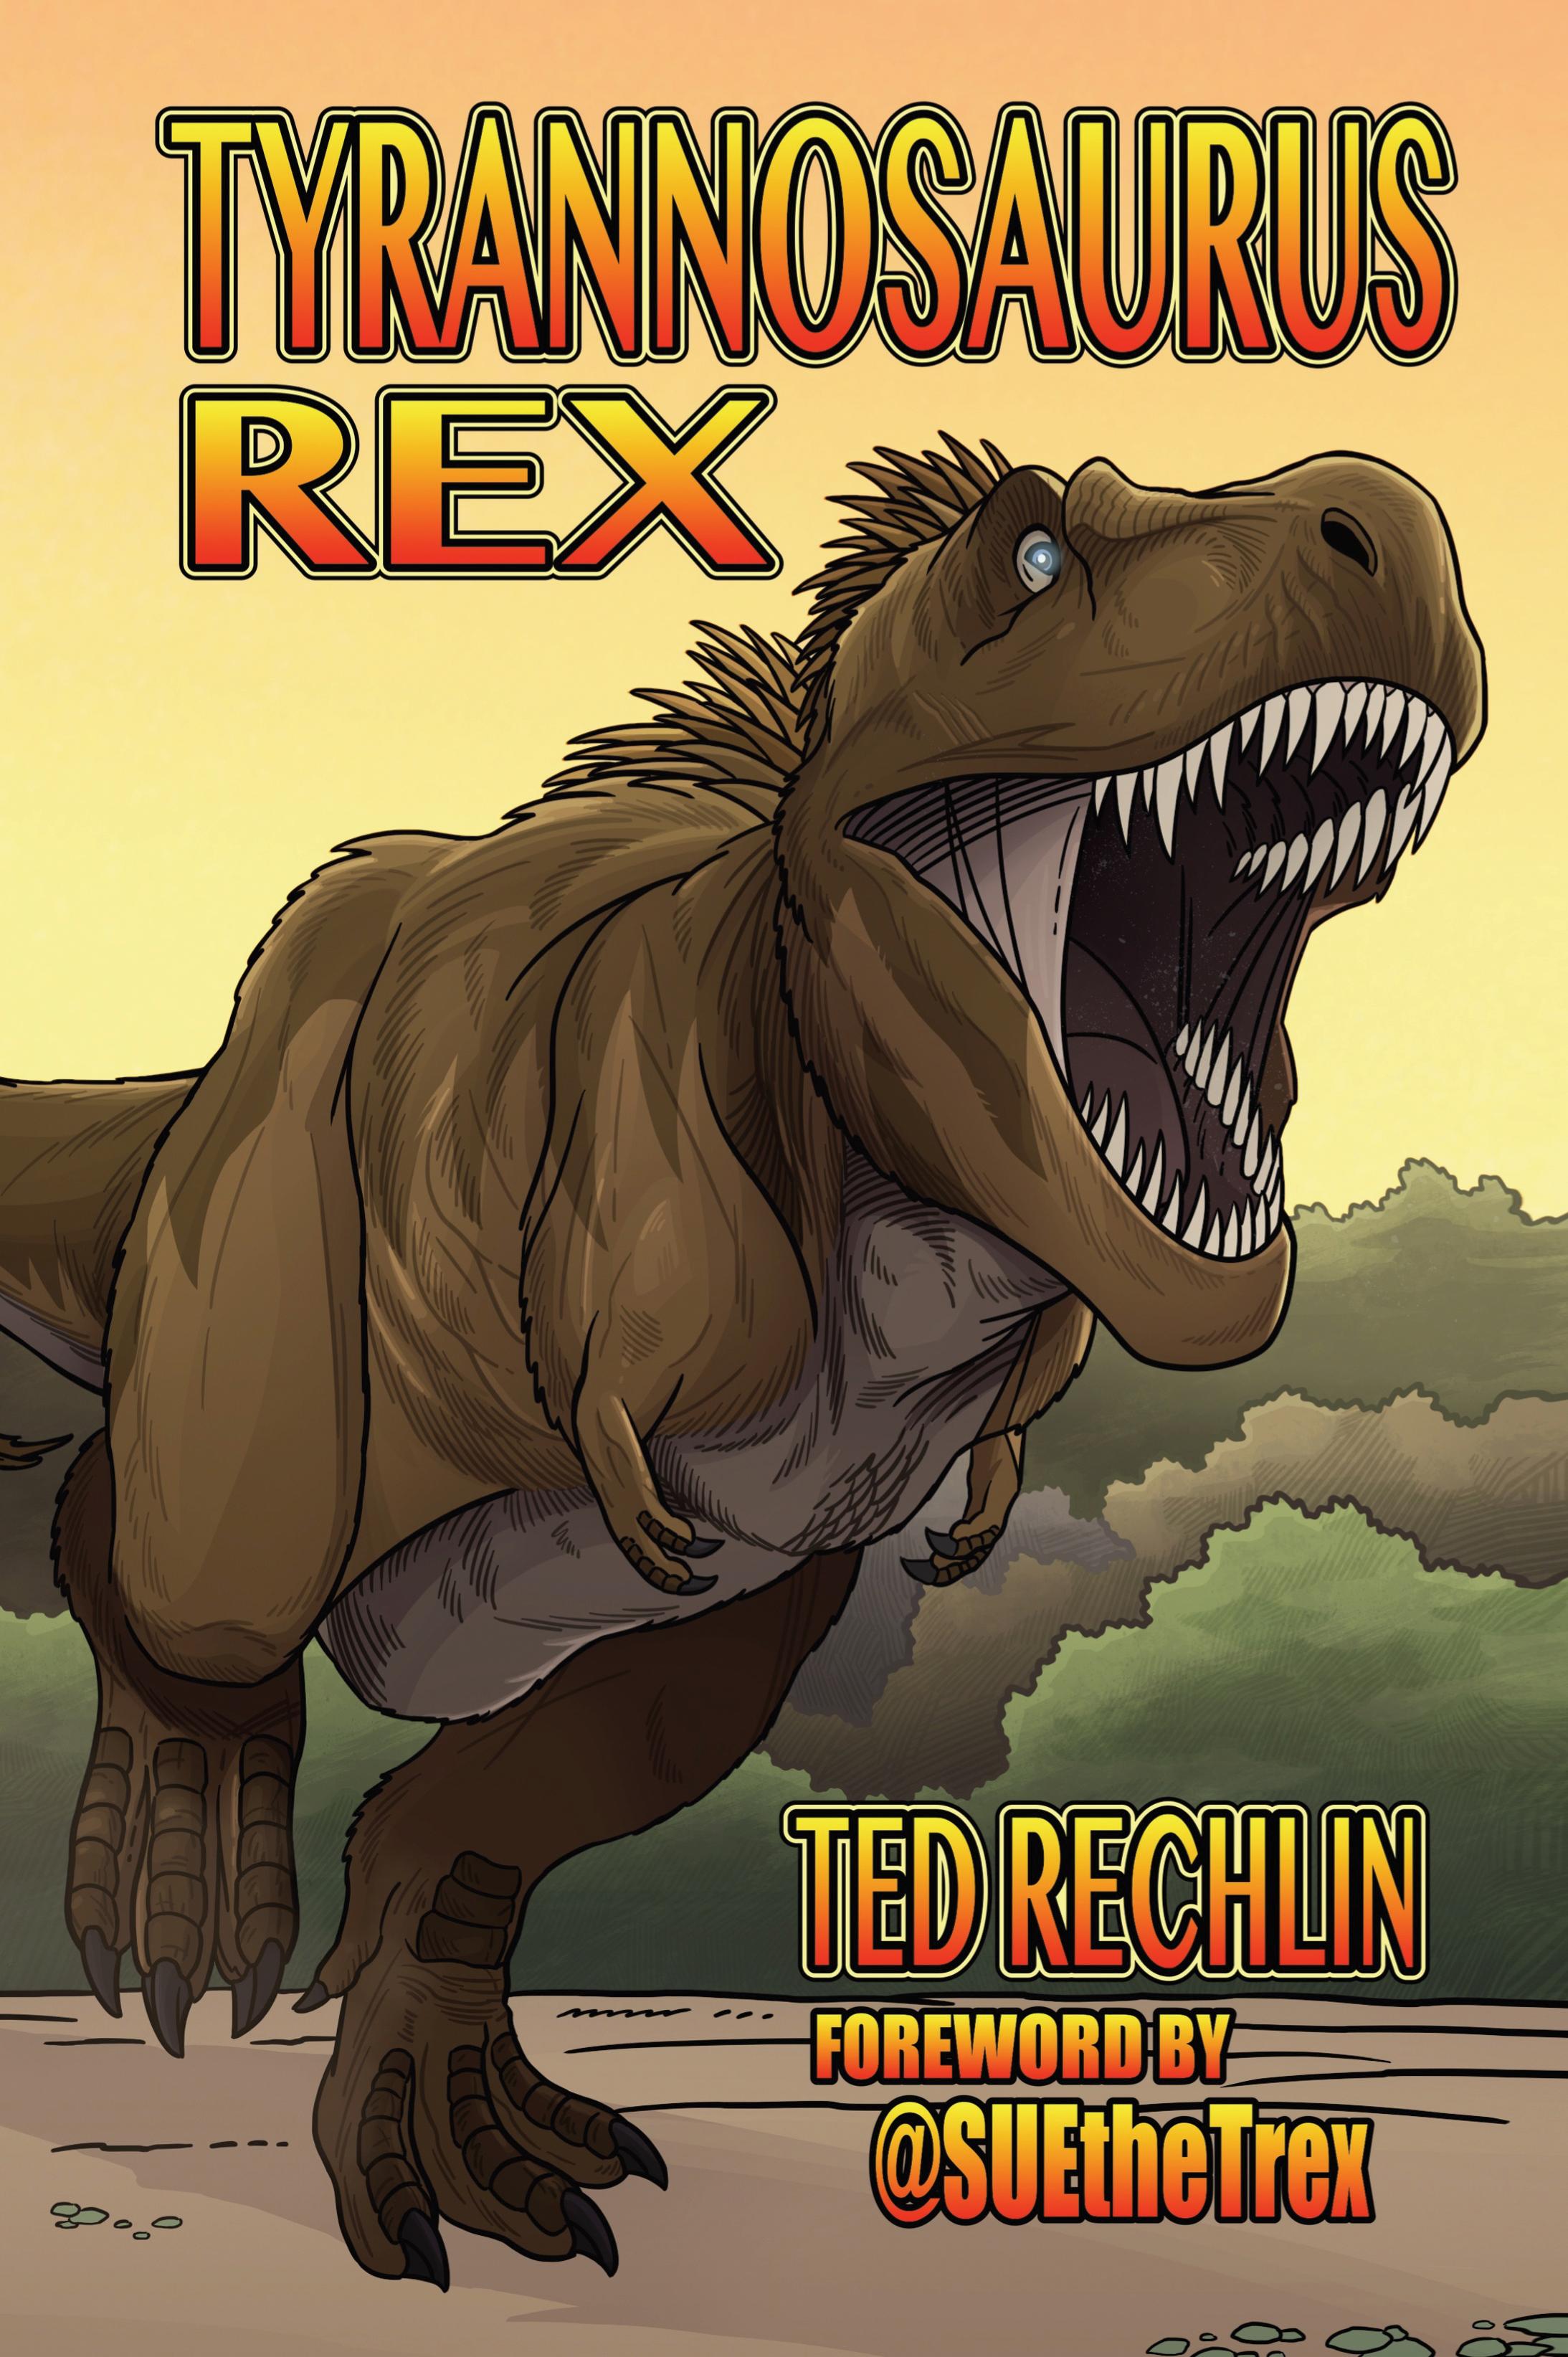 Tyrannosaurus Rex - Ted Rechlin